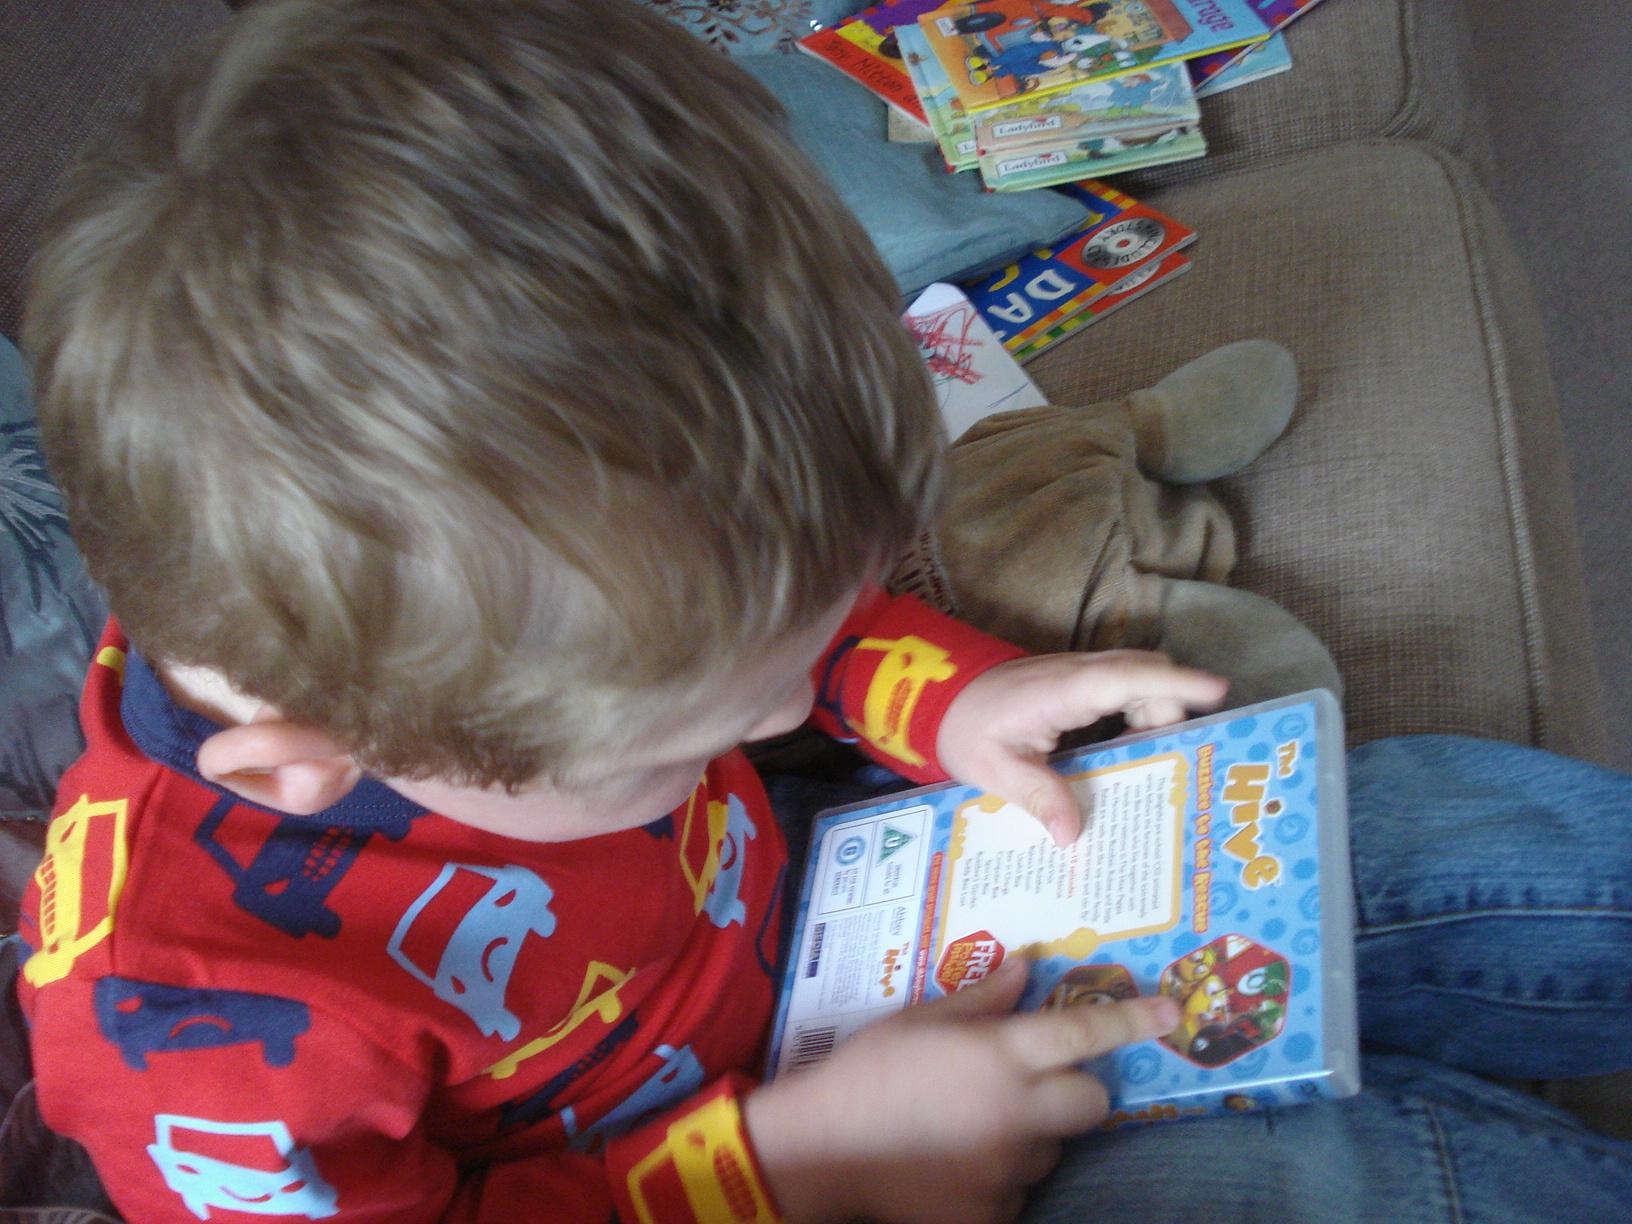 Buzzbee to the Rescue DVD